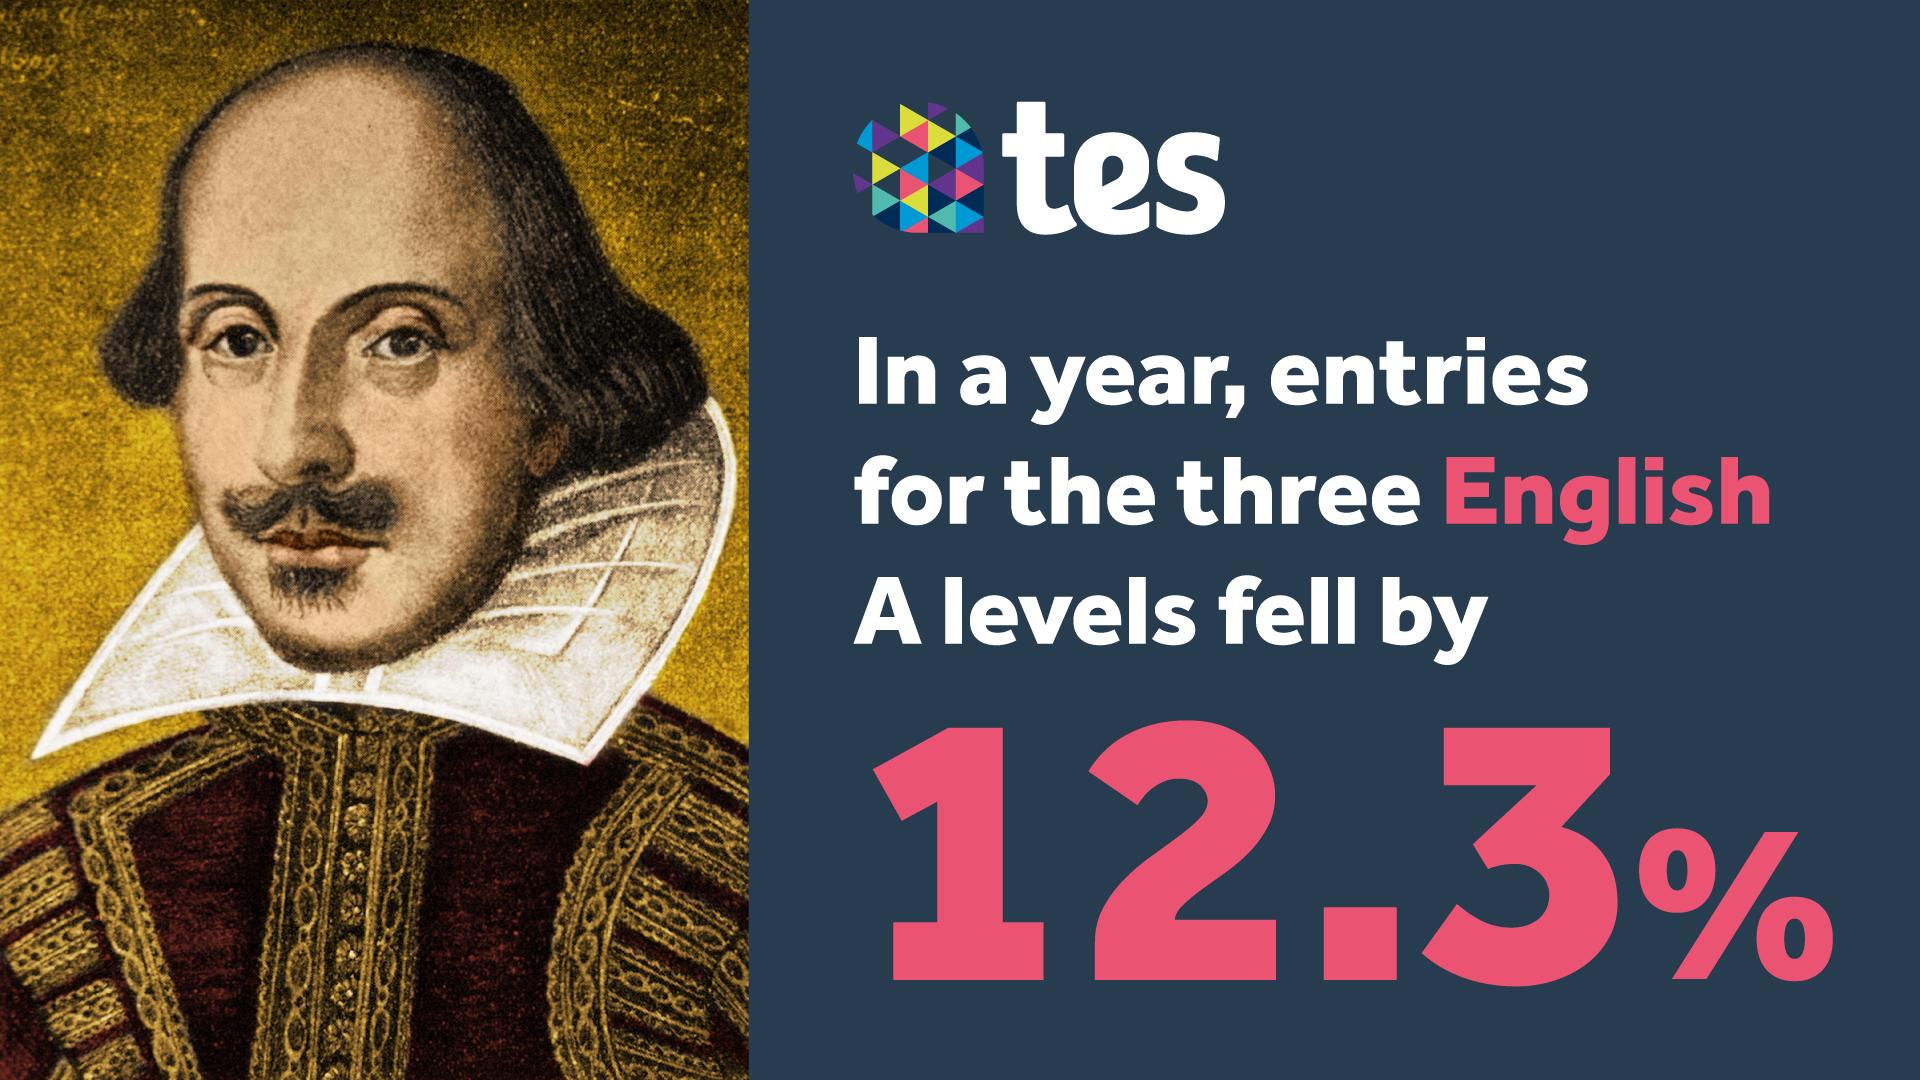 A-level stats